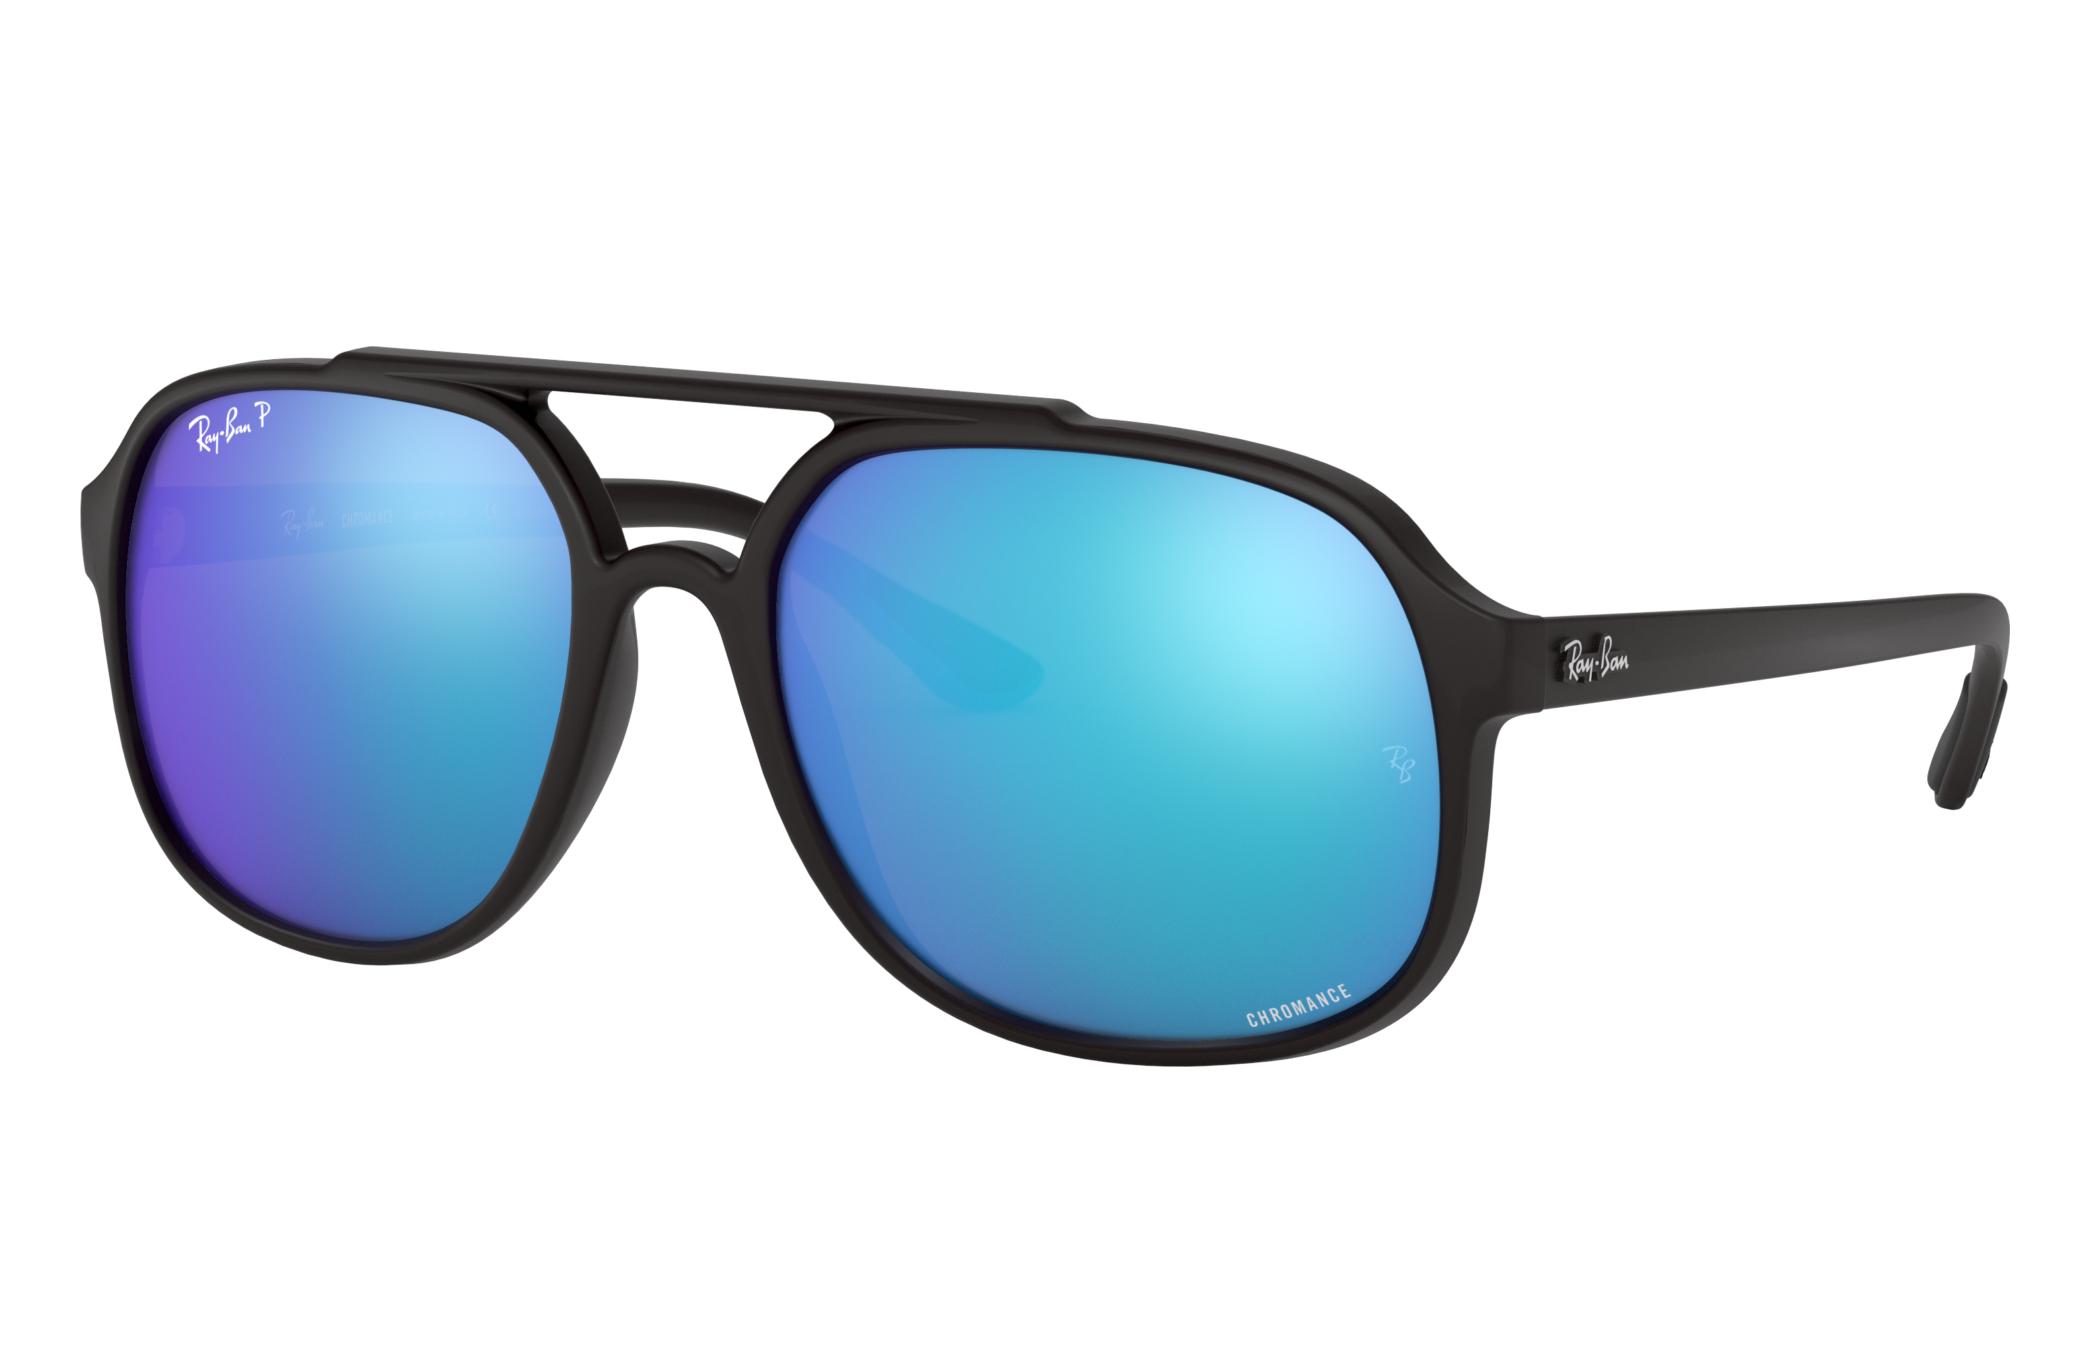 Ray-Ban Rb4312 Chromance Black, Polarized Blue Lenses - RB4312CH